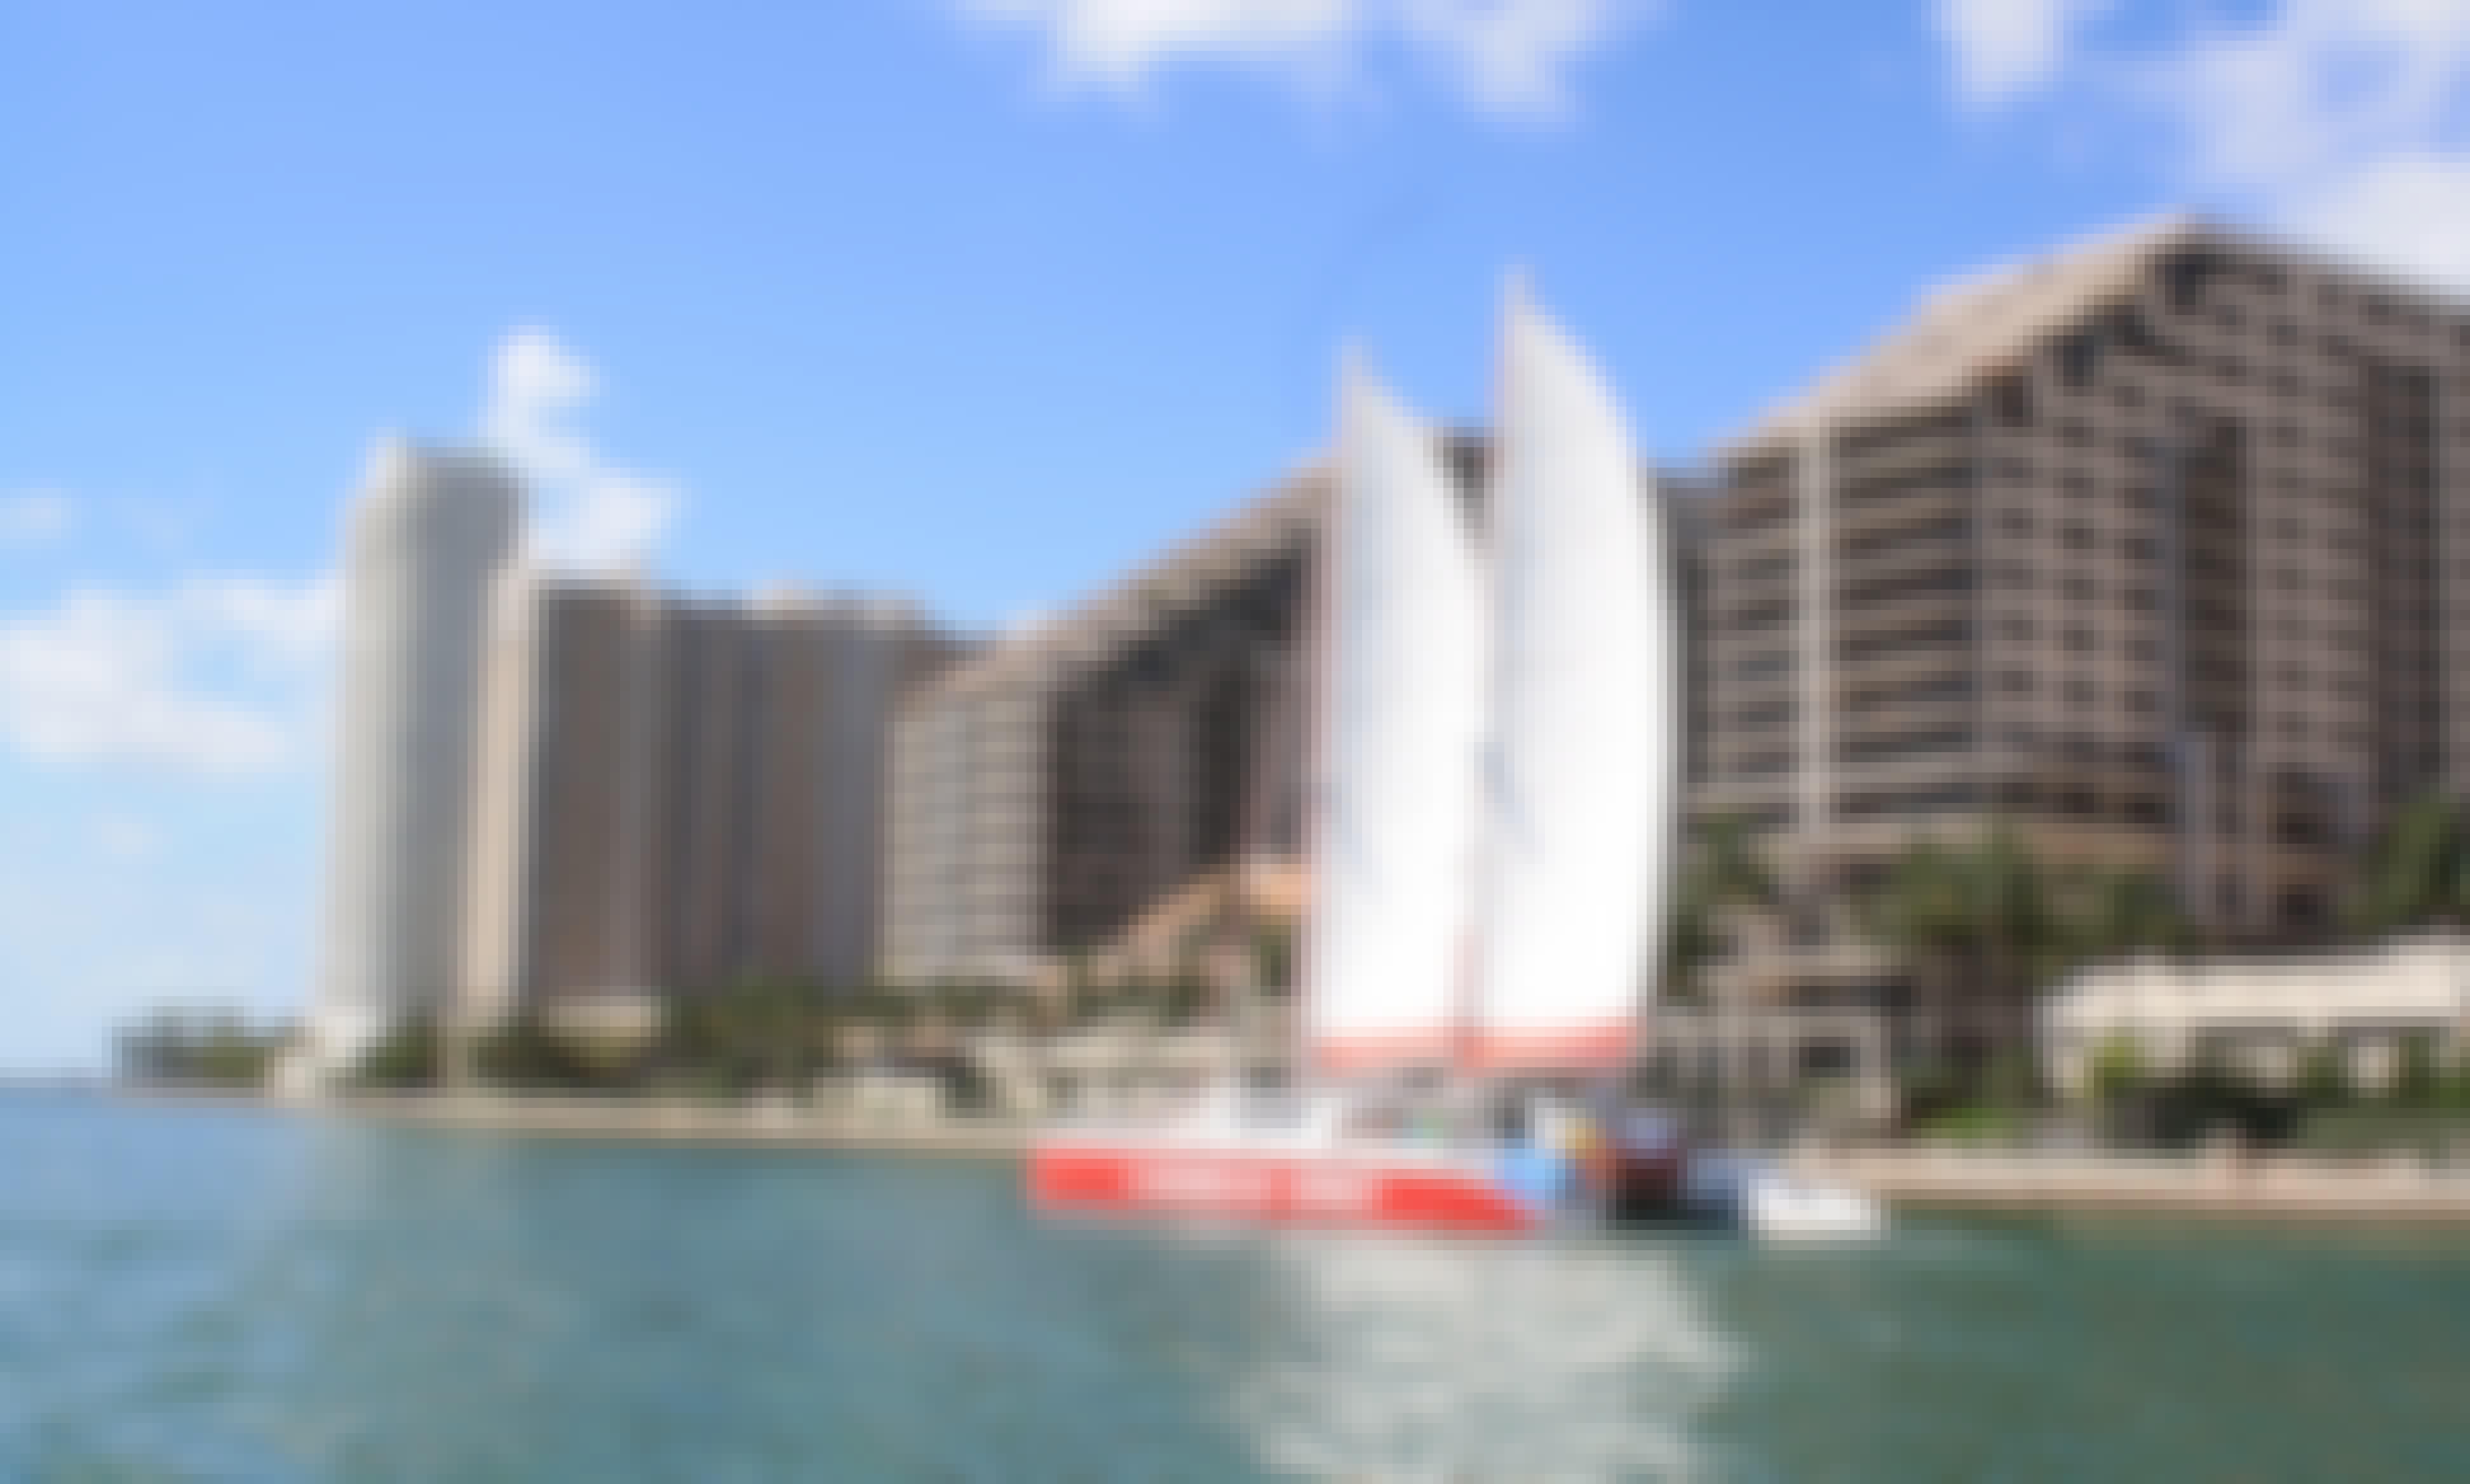 Sail Aboard the Largest Catamaran - 78' Gold Coast in Miami